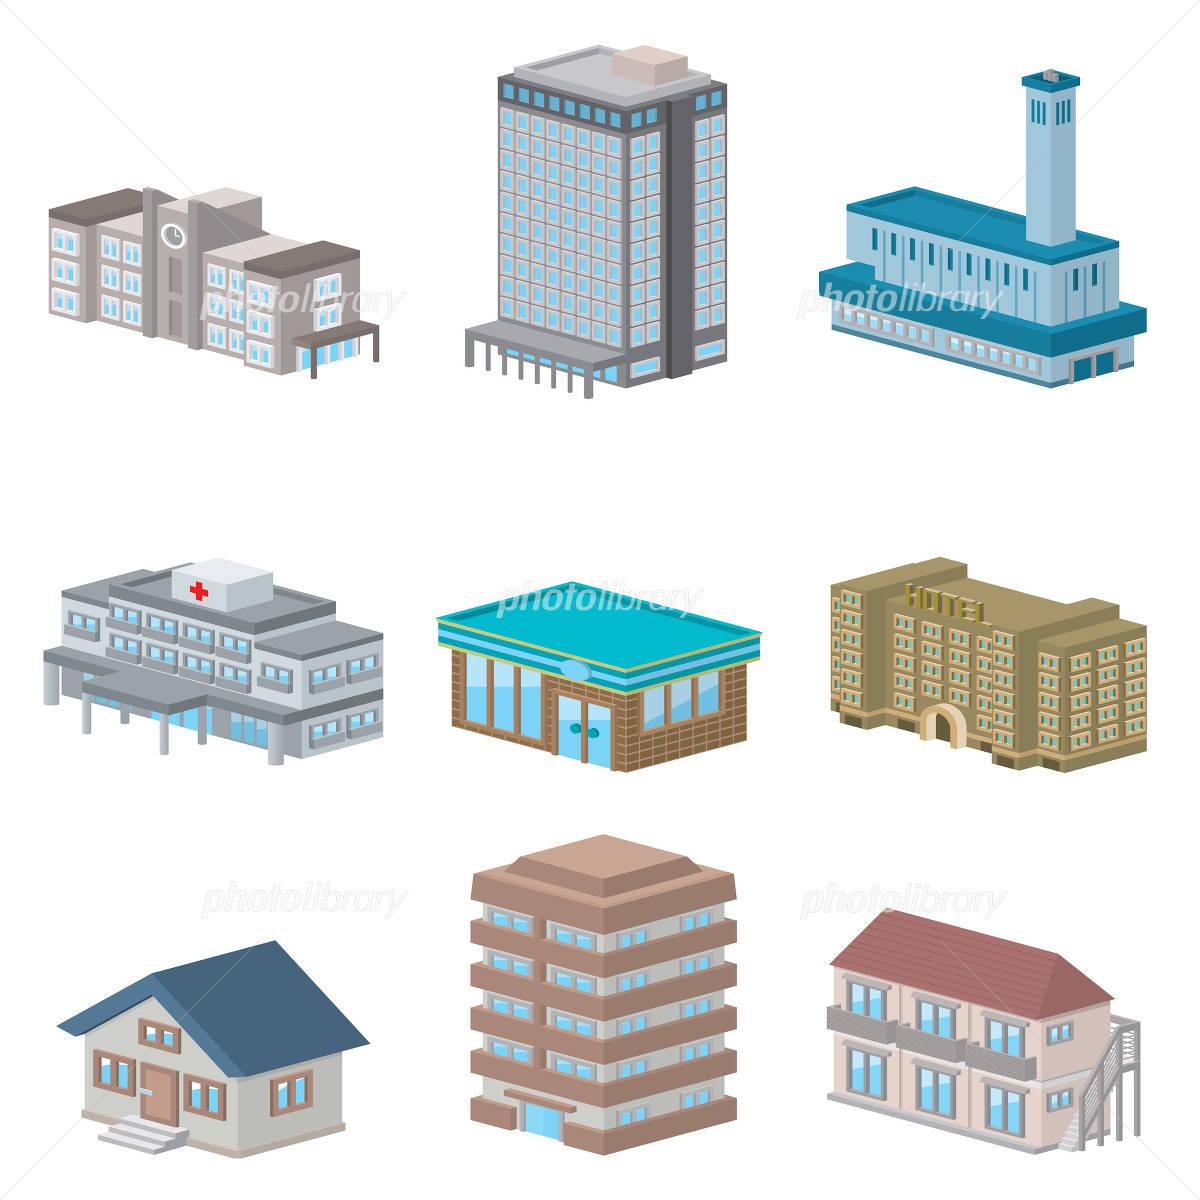 Building イラスト素材